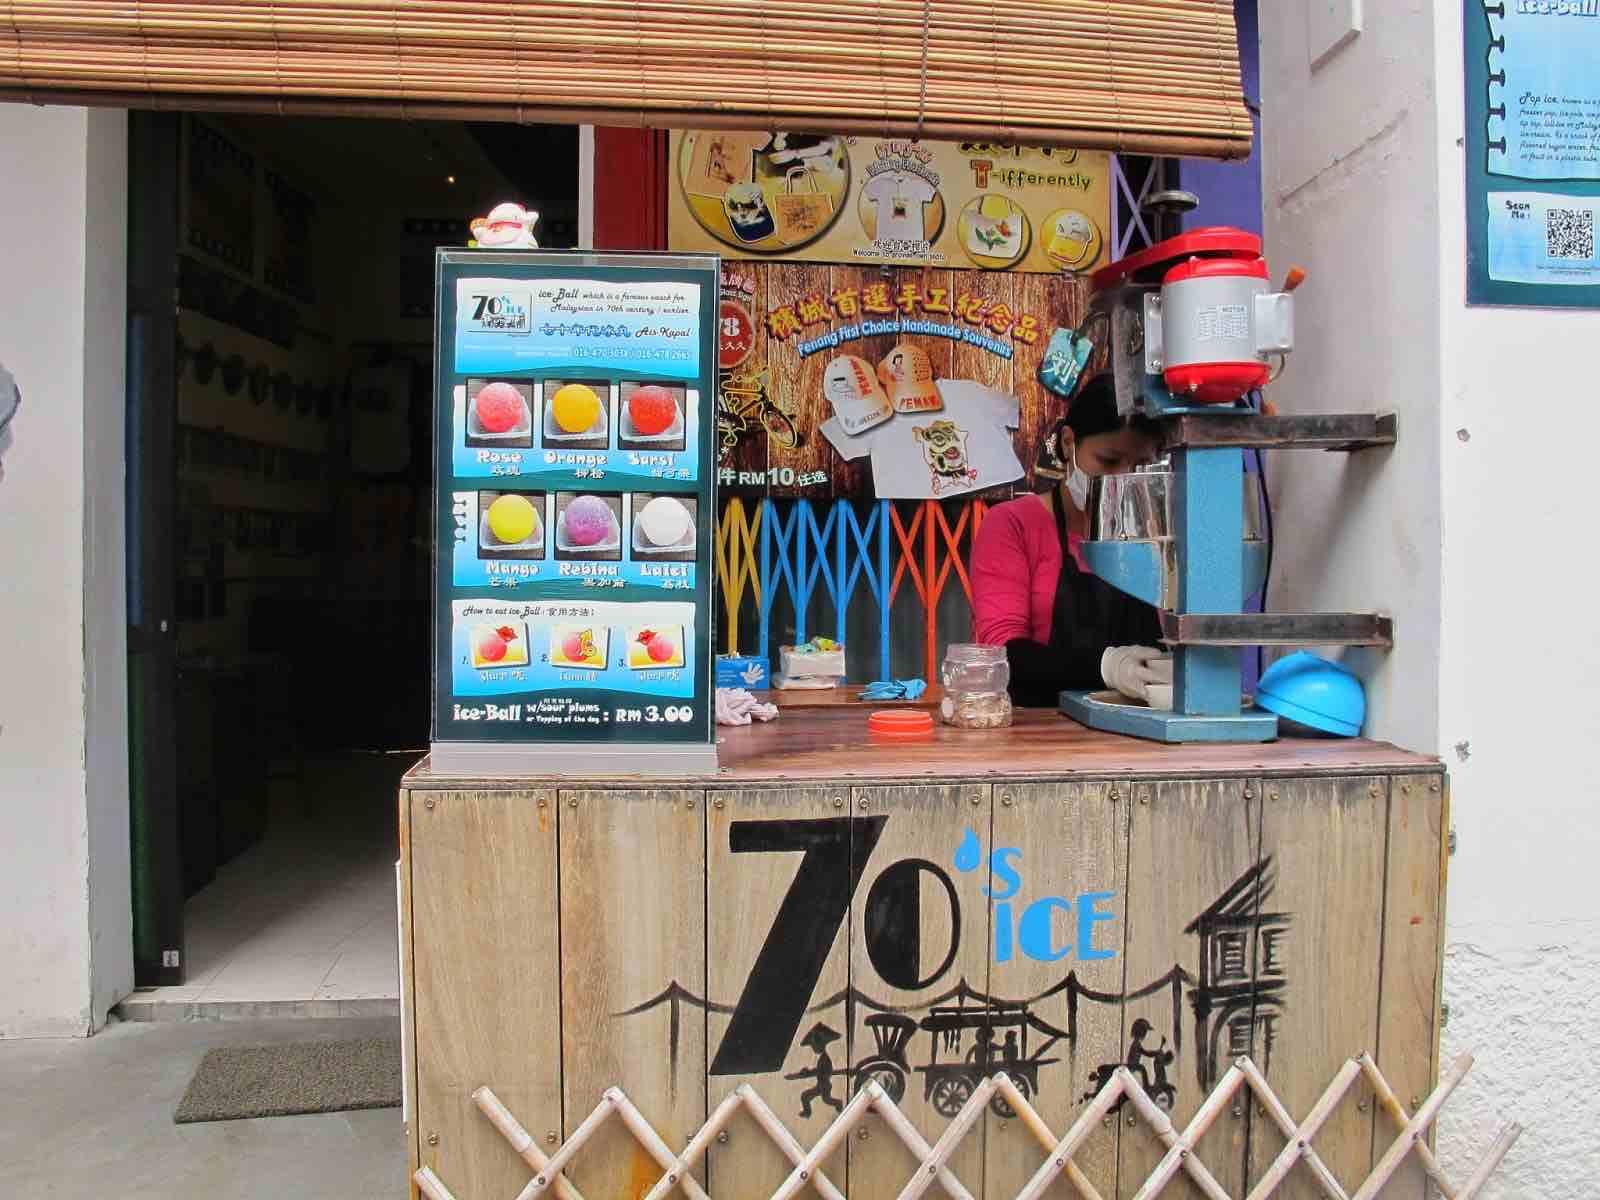 70's Ice Penang - AspirantSG